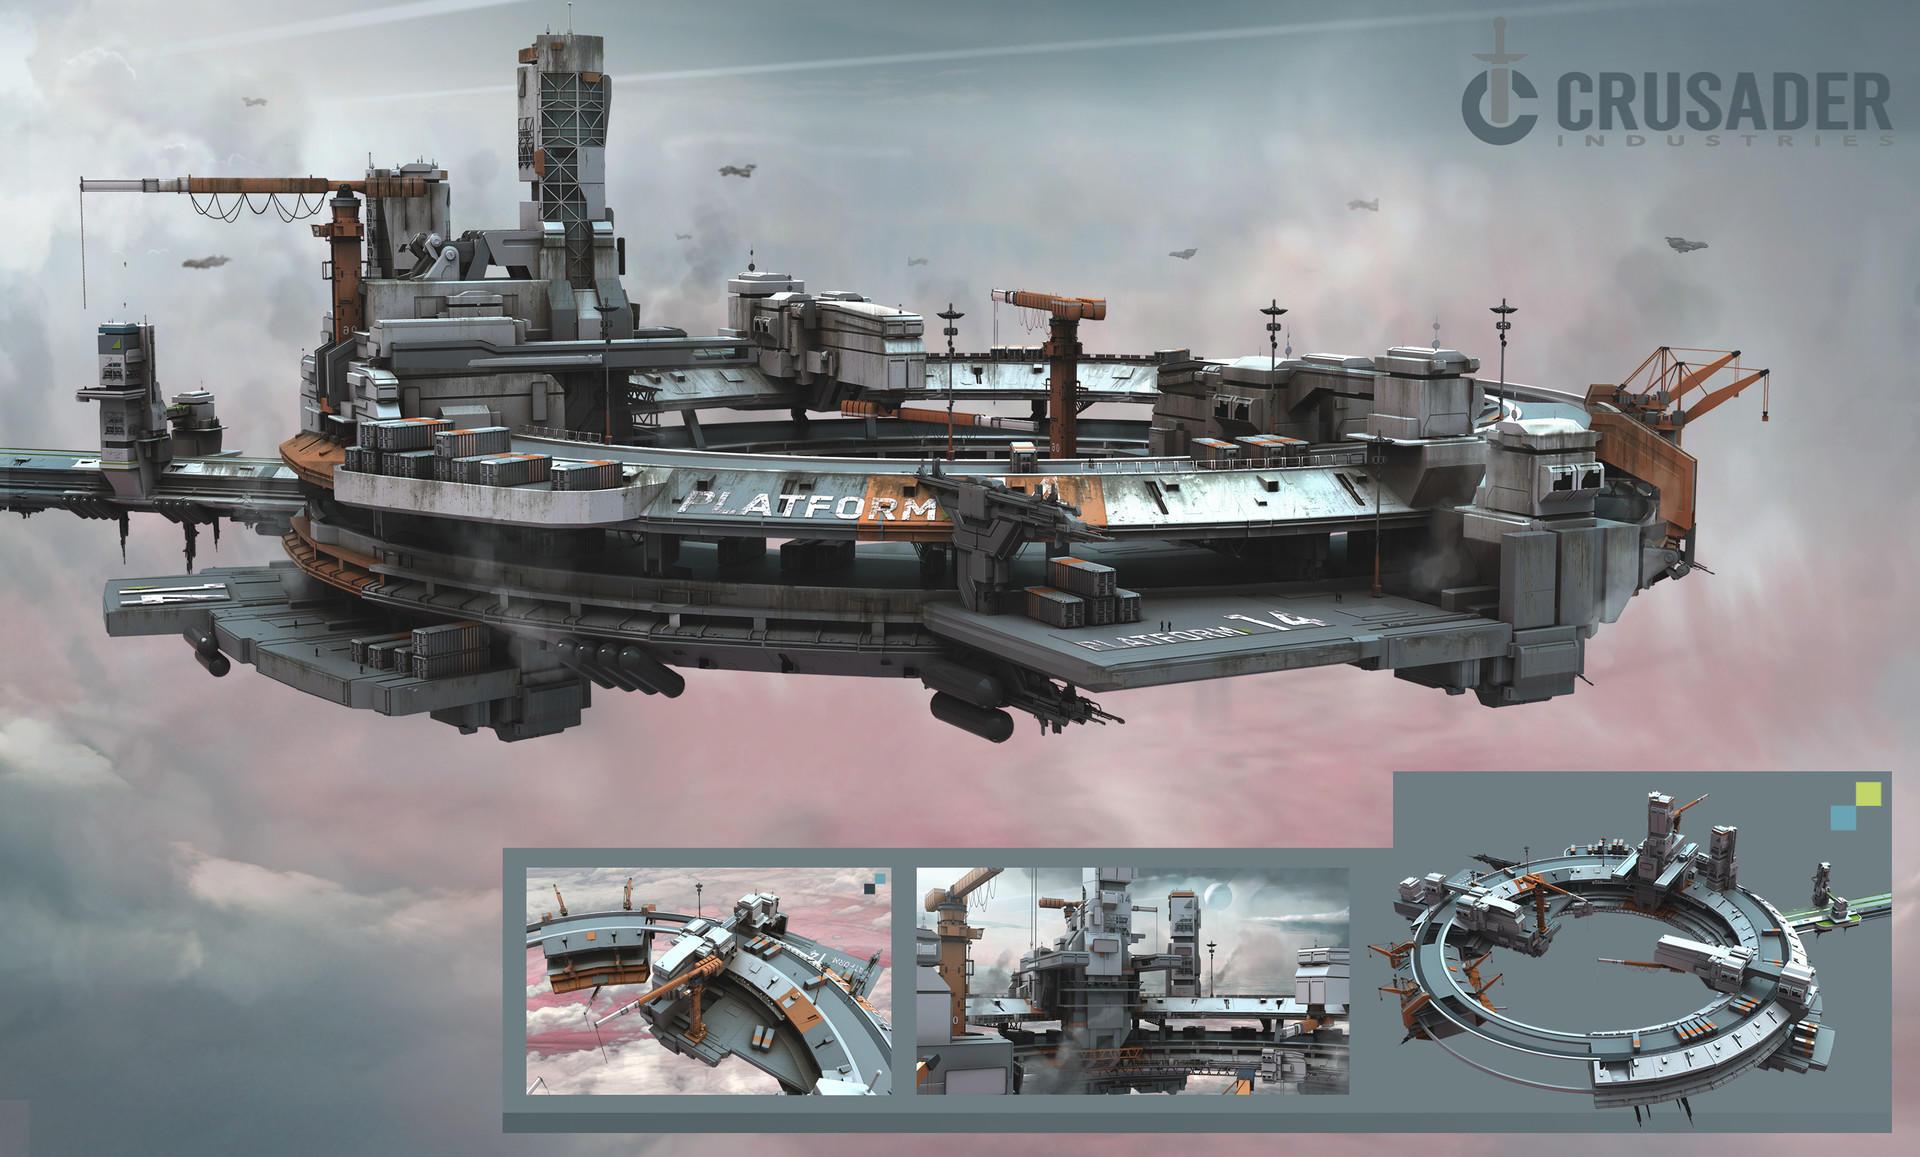 platforma-stocznia.jpg